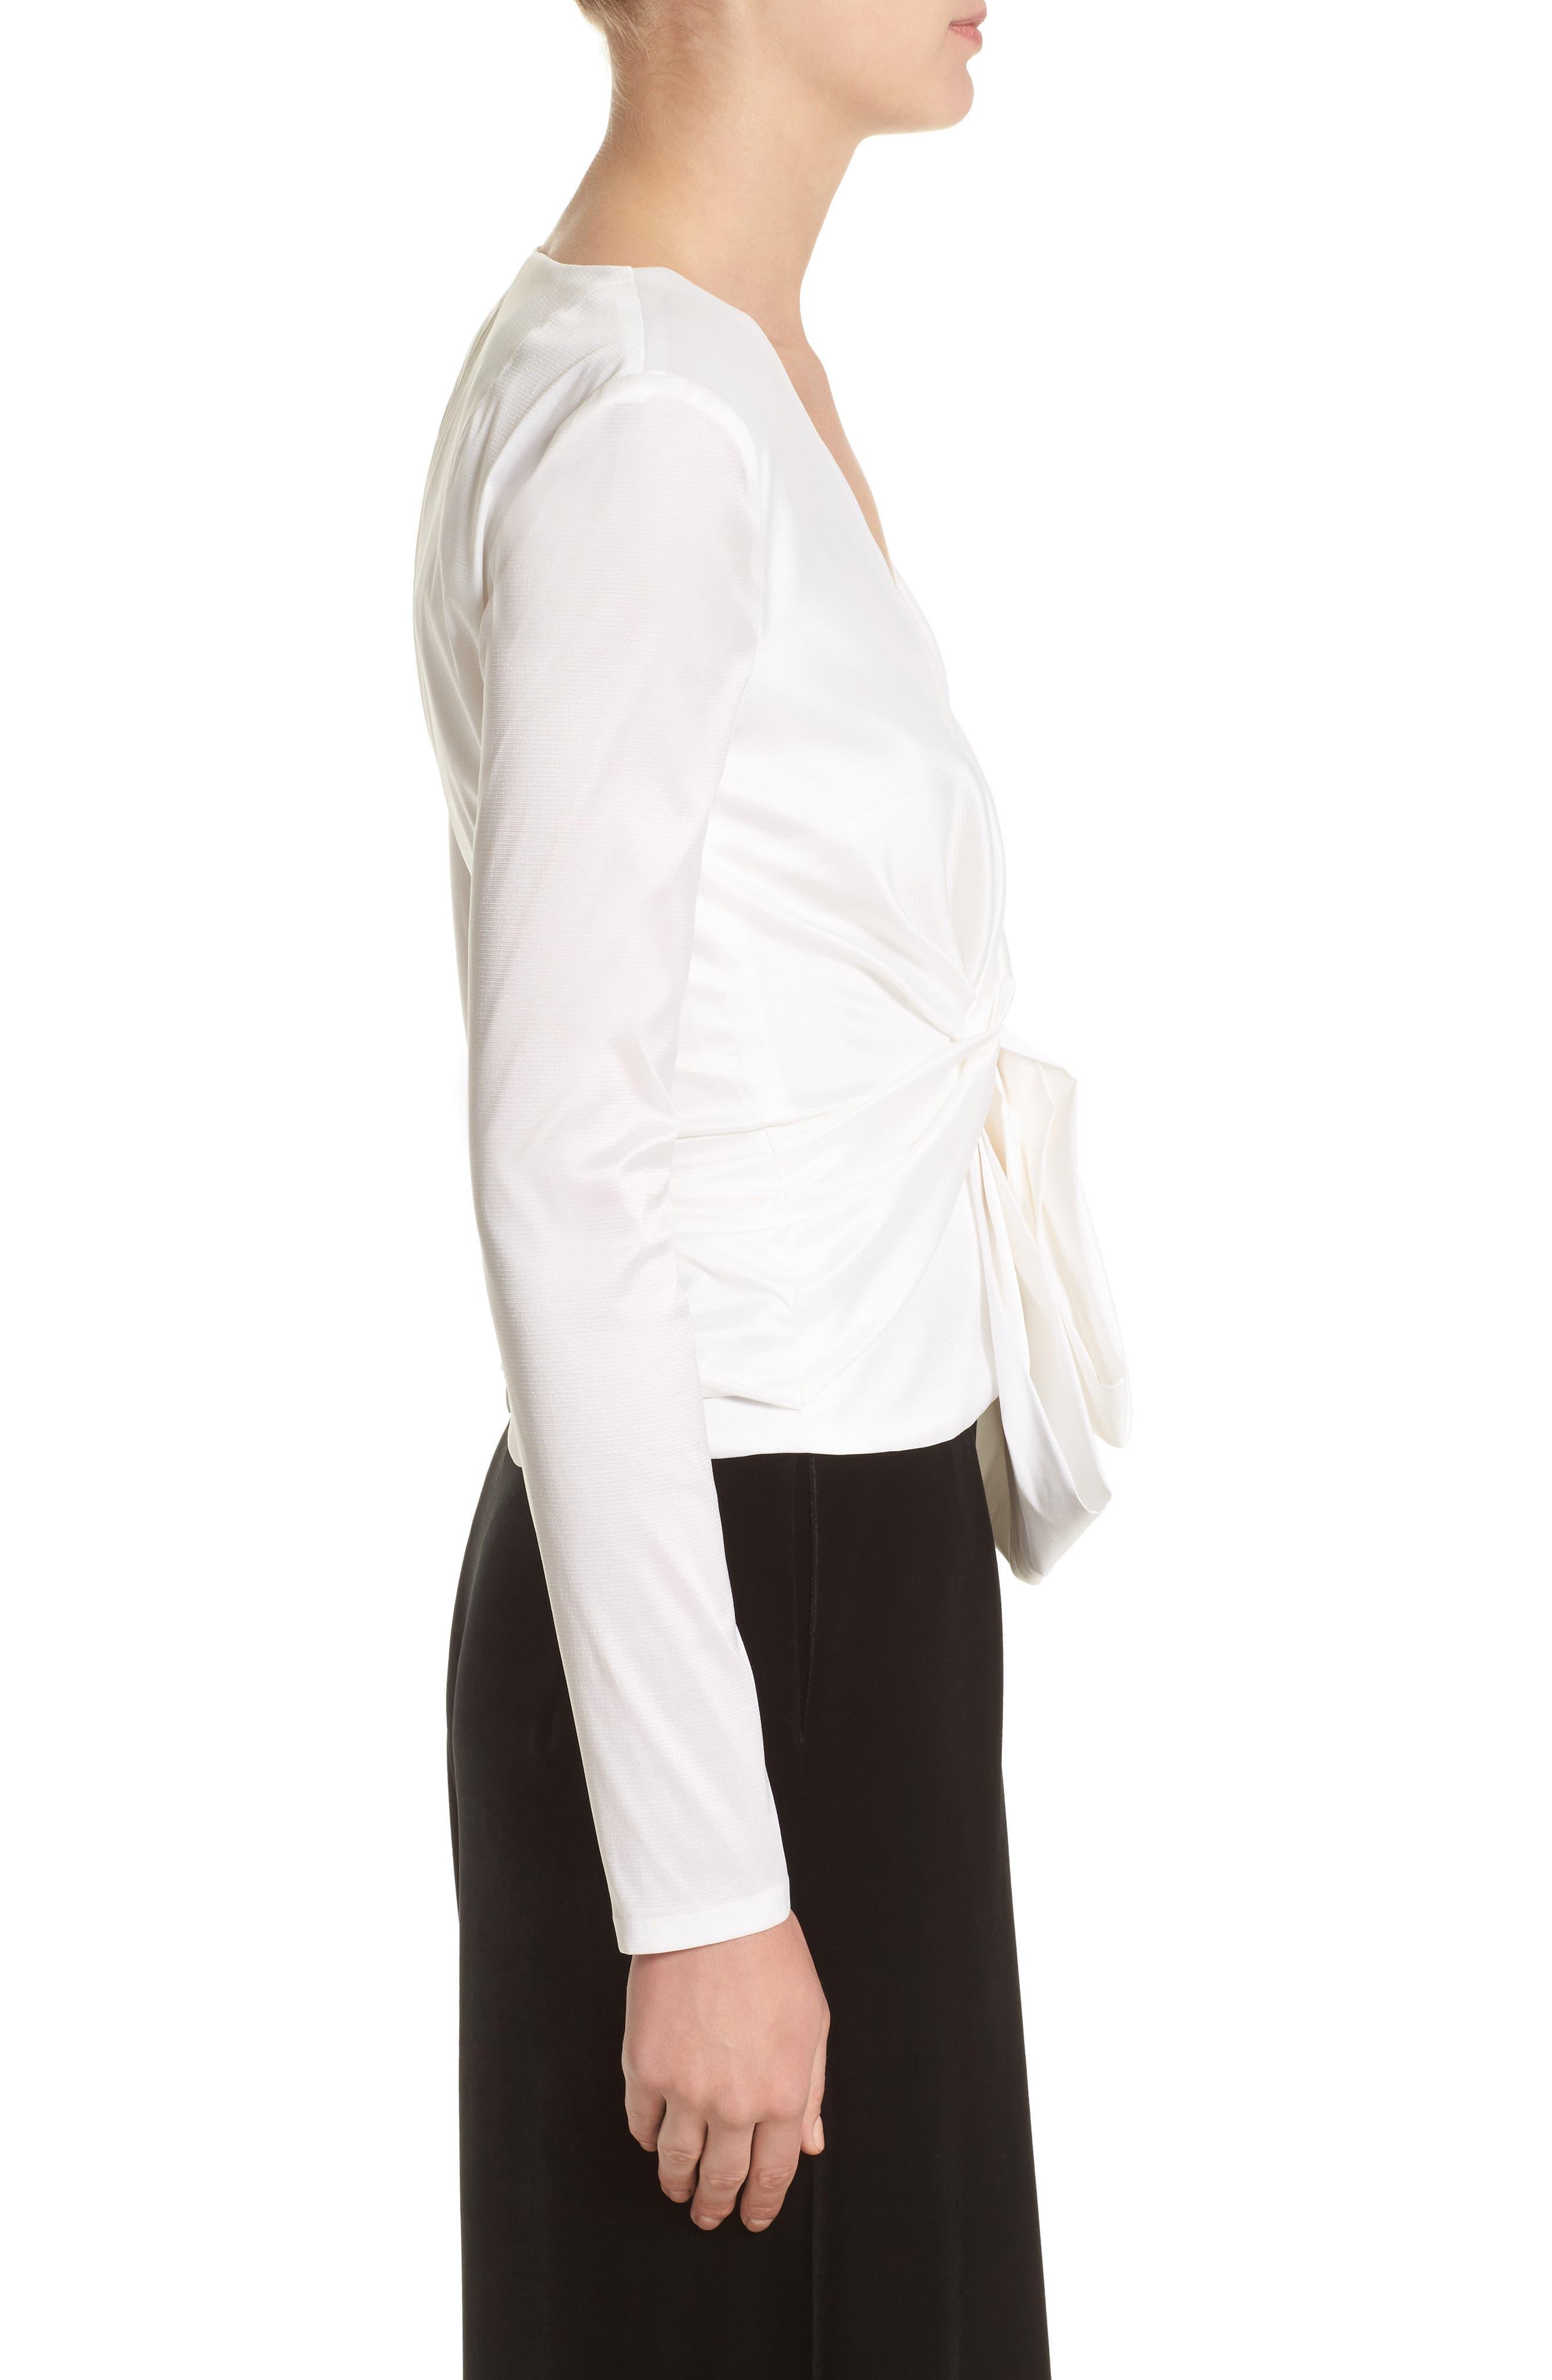 V-Neck Blouse with Bow Detail,                             Alternate thumbnail 3, color,                             White